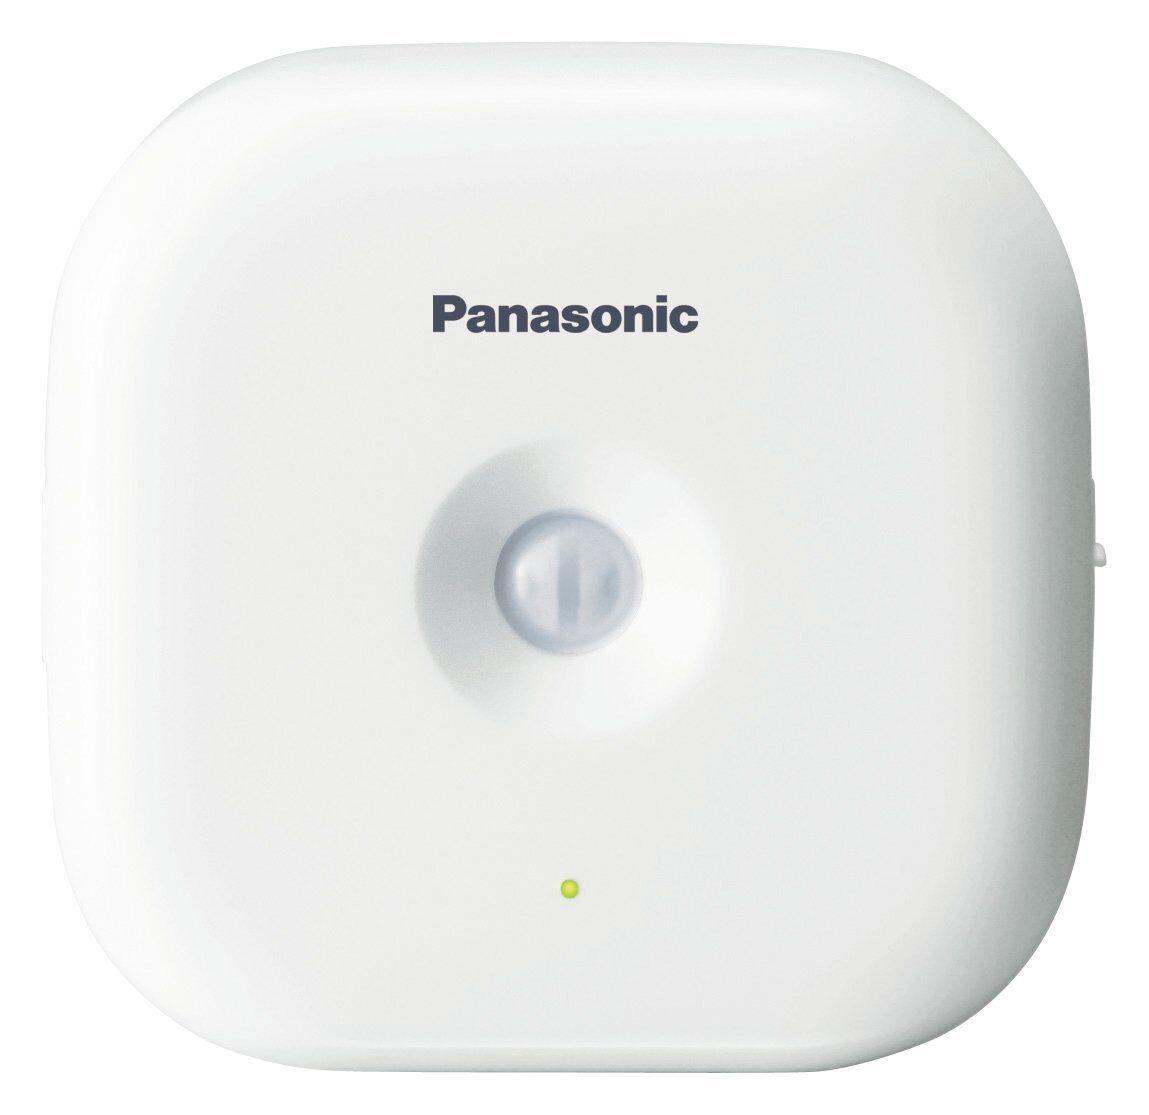 Panasonic KX-HNS102W Wireless Motion Sensor for Smart Home M